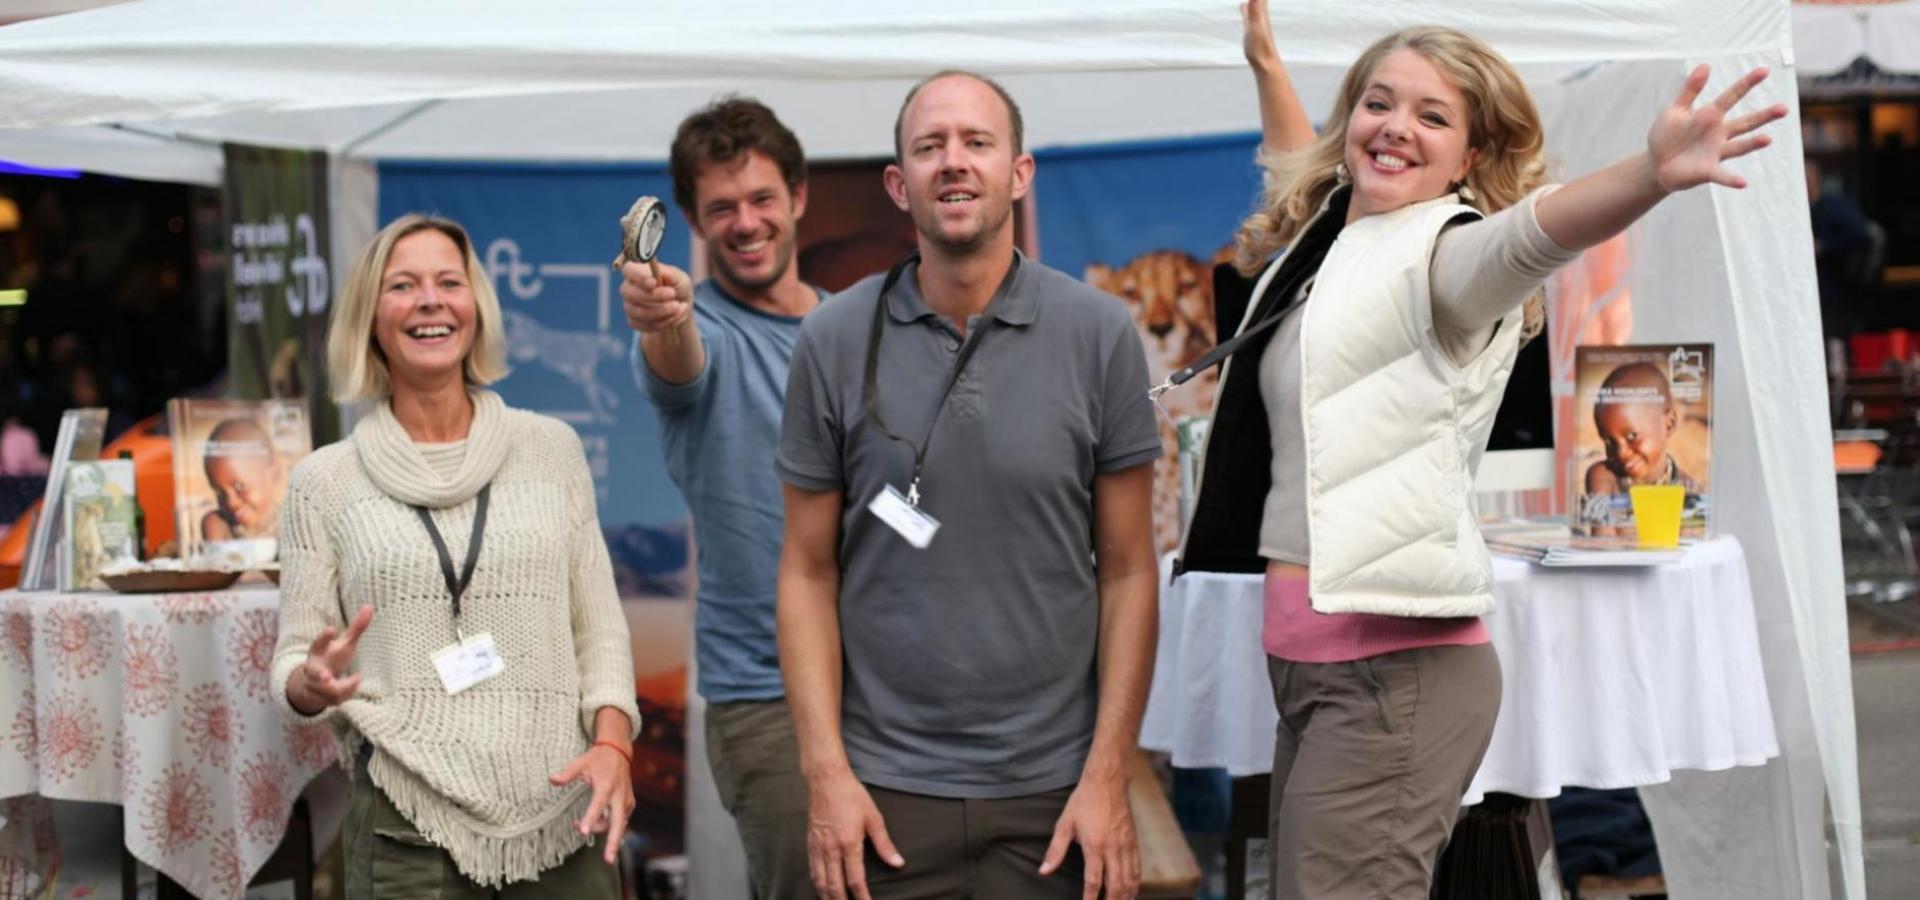 Afrika Tours Individuell Team auf dem Schwabinger Street Life Festival